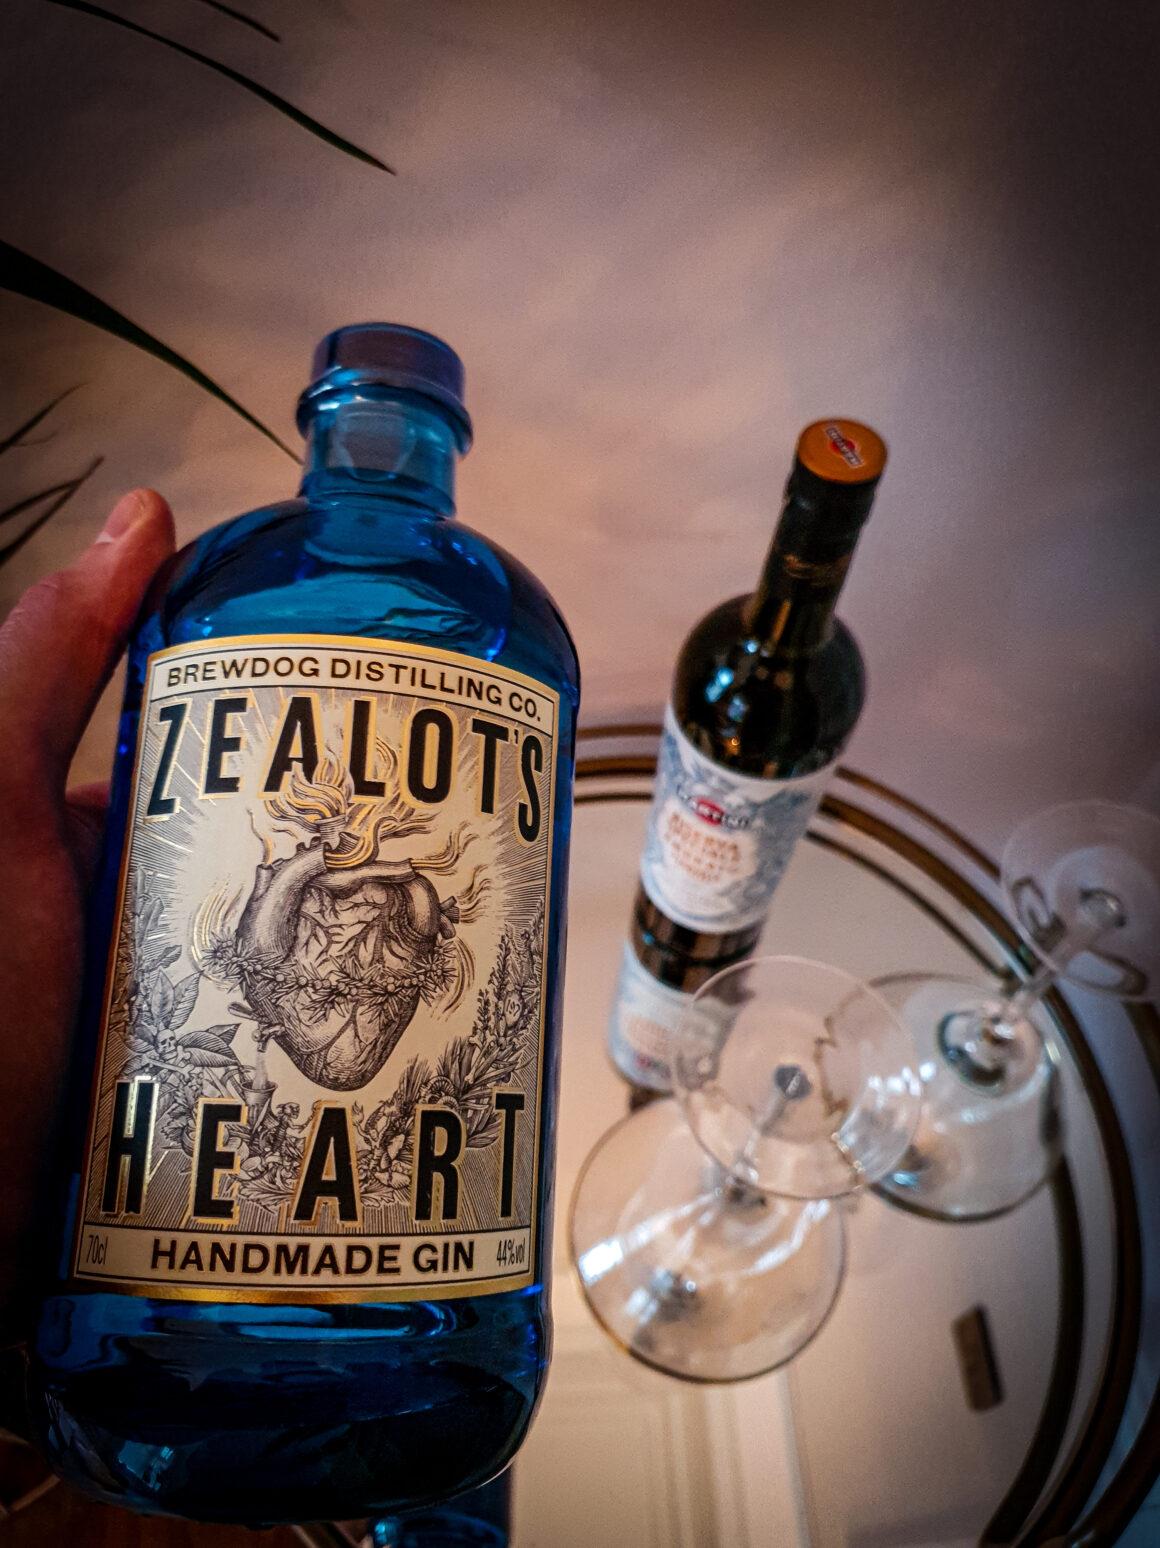 NYE Cocktail Creation - BrewDog Zealot's Heart Martini BrewDog Distilling Co